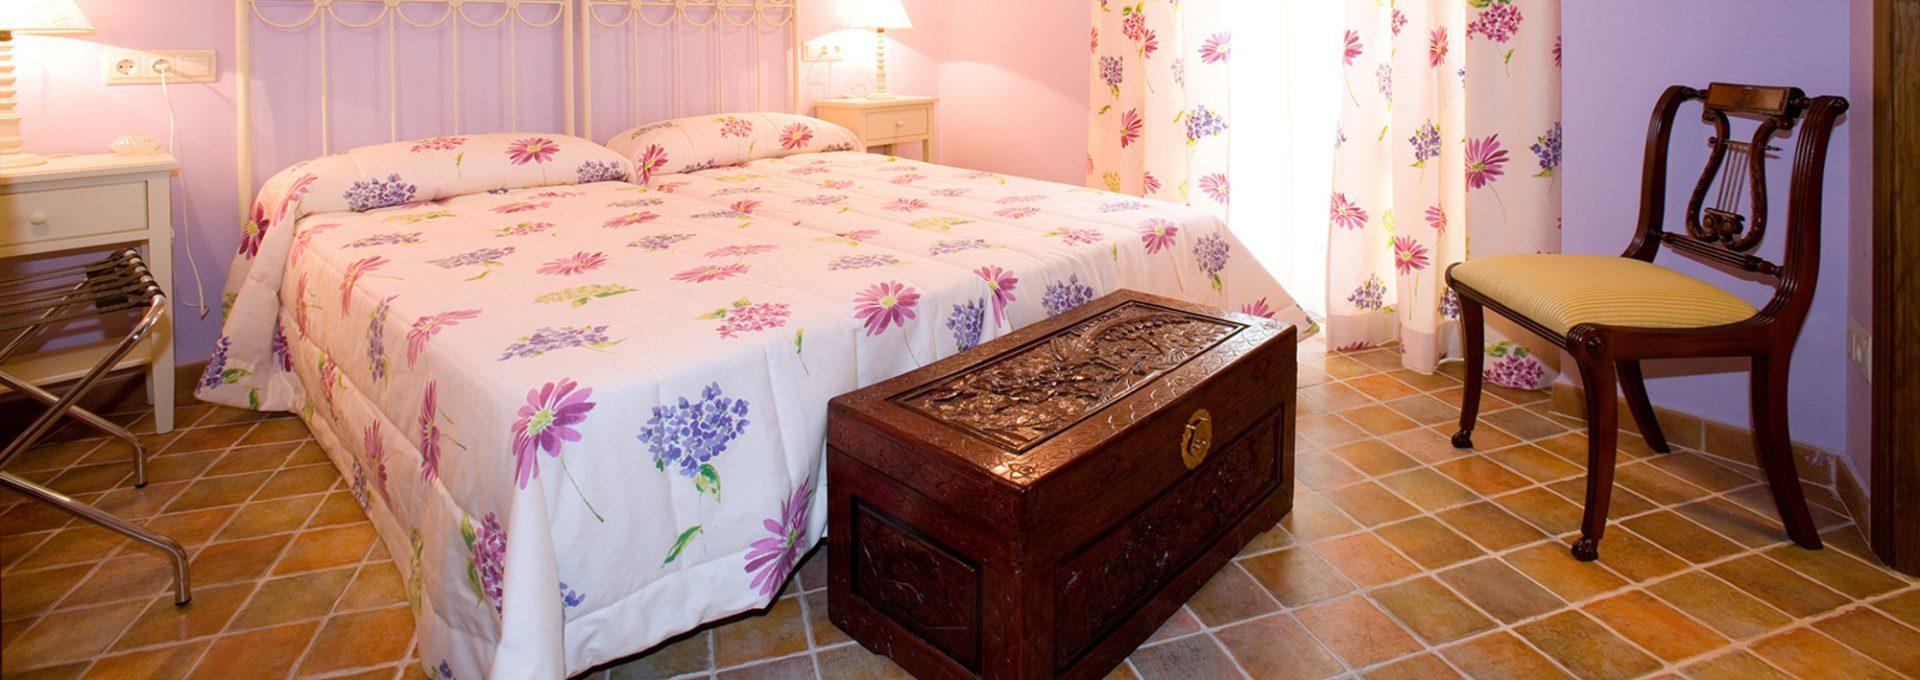 Hotel Rural El Pilaret - Azanuy (Huesca)